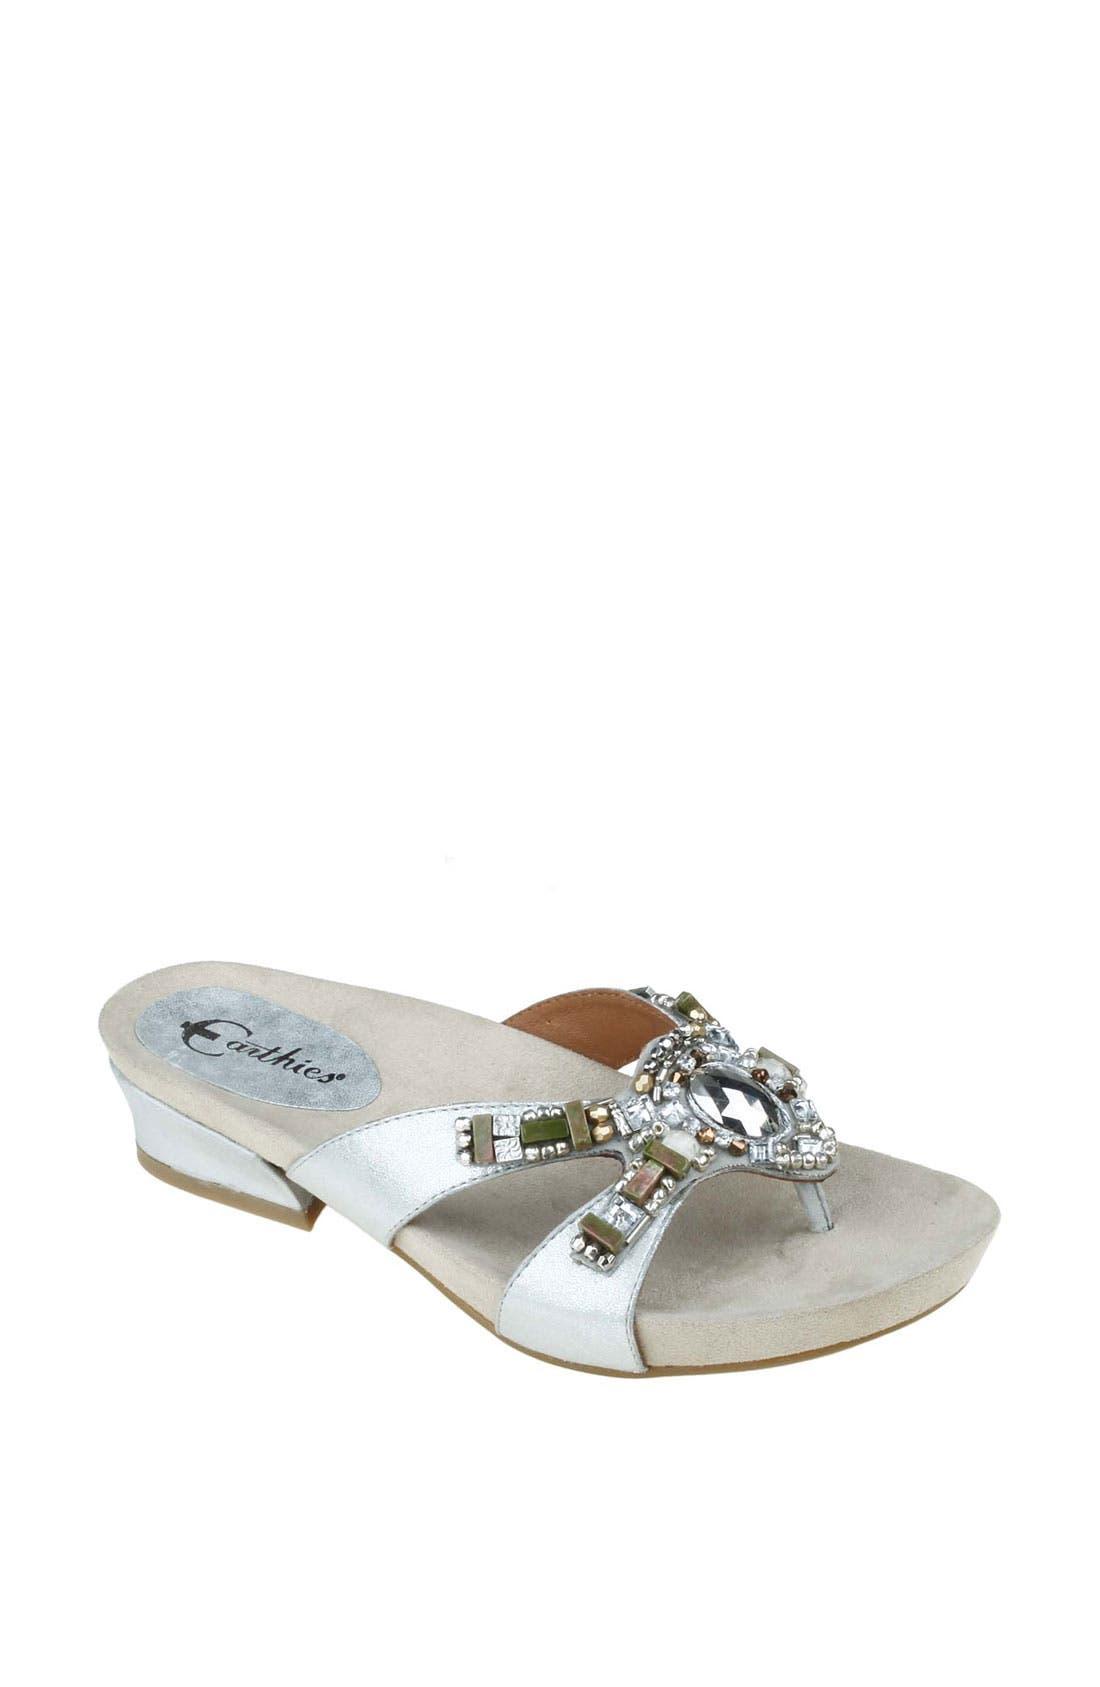 Alternate Image 1 Selected - Earthies® 'La Zeretta' Sandal